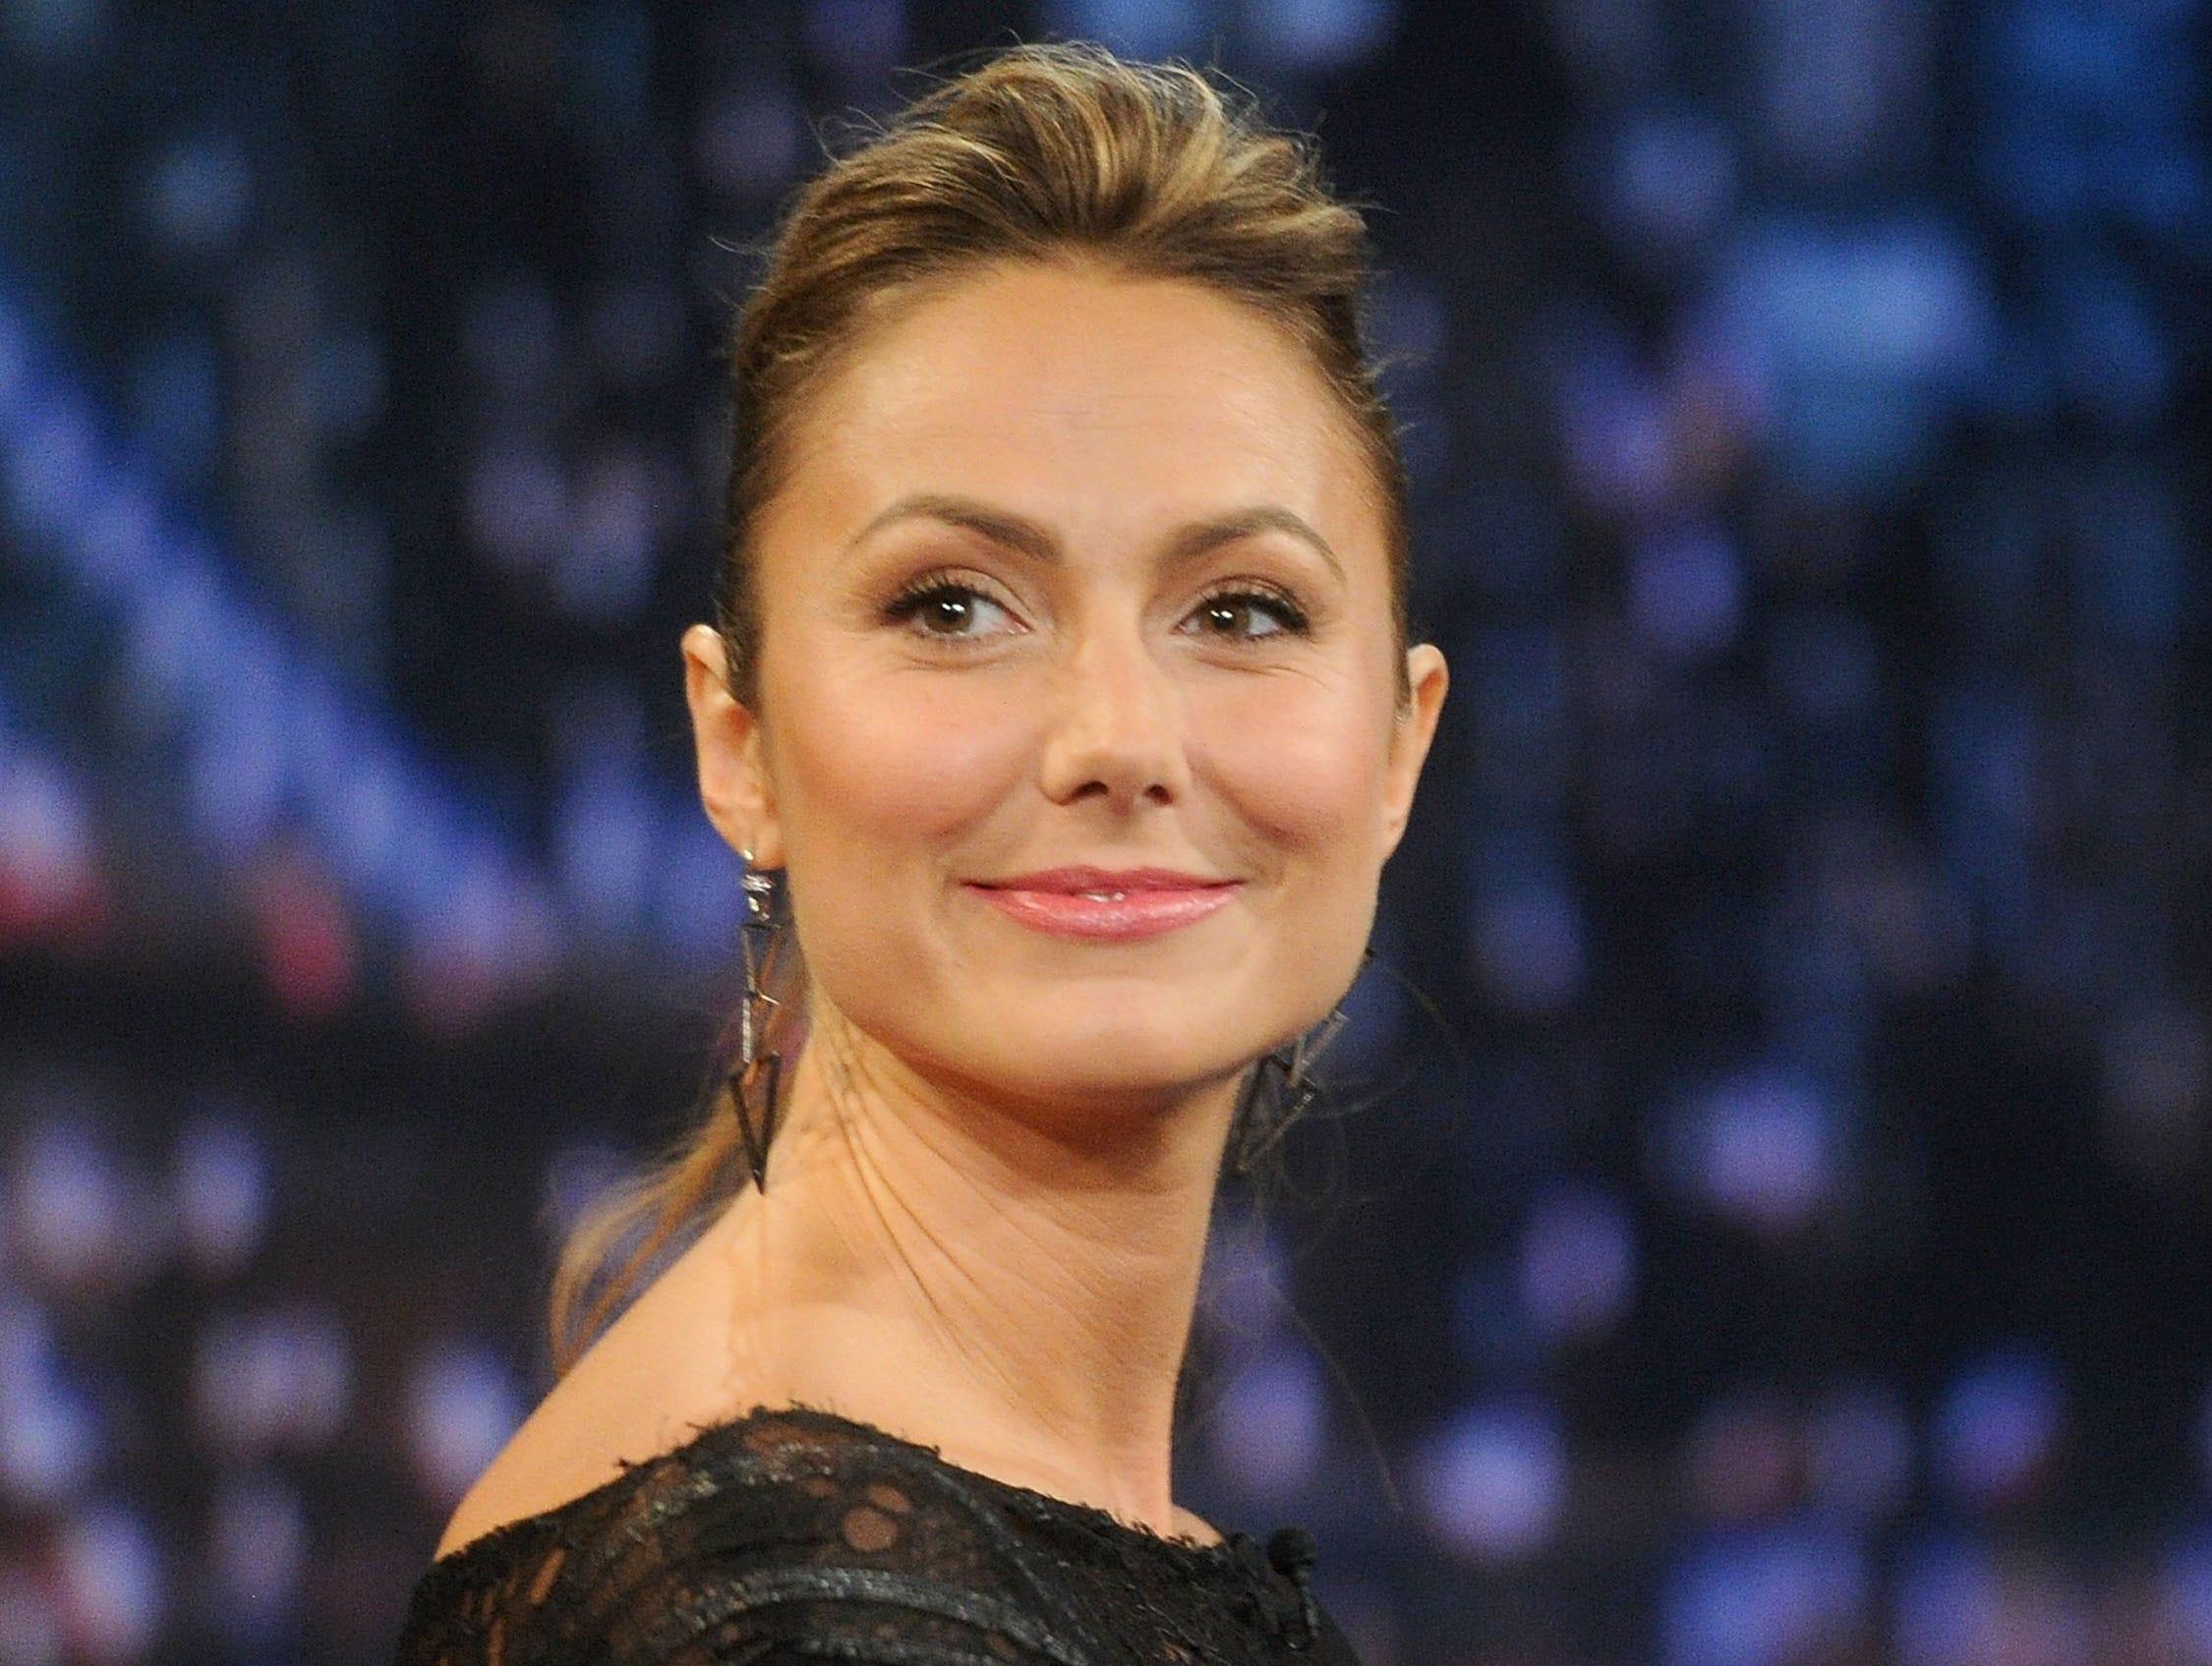 Stacy Keibler then: Just a few weeks ago, Keibler, 33, was simply George Clooney's Amazon-next-door ex ...